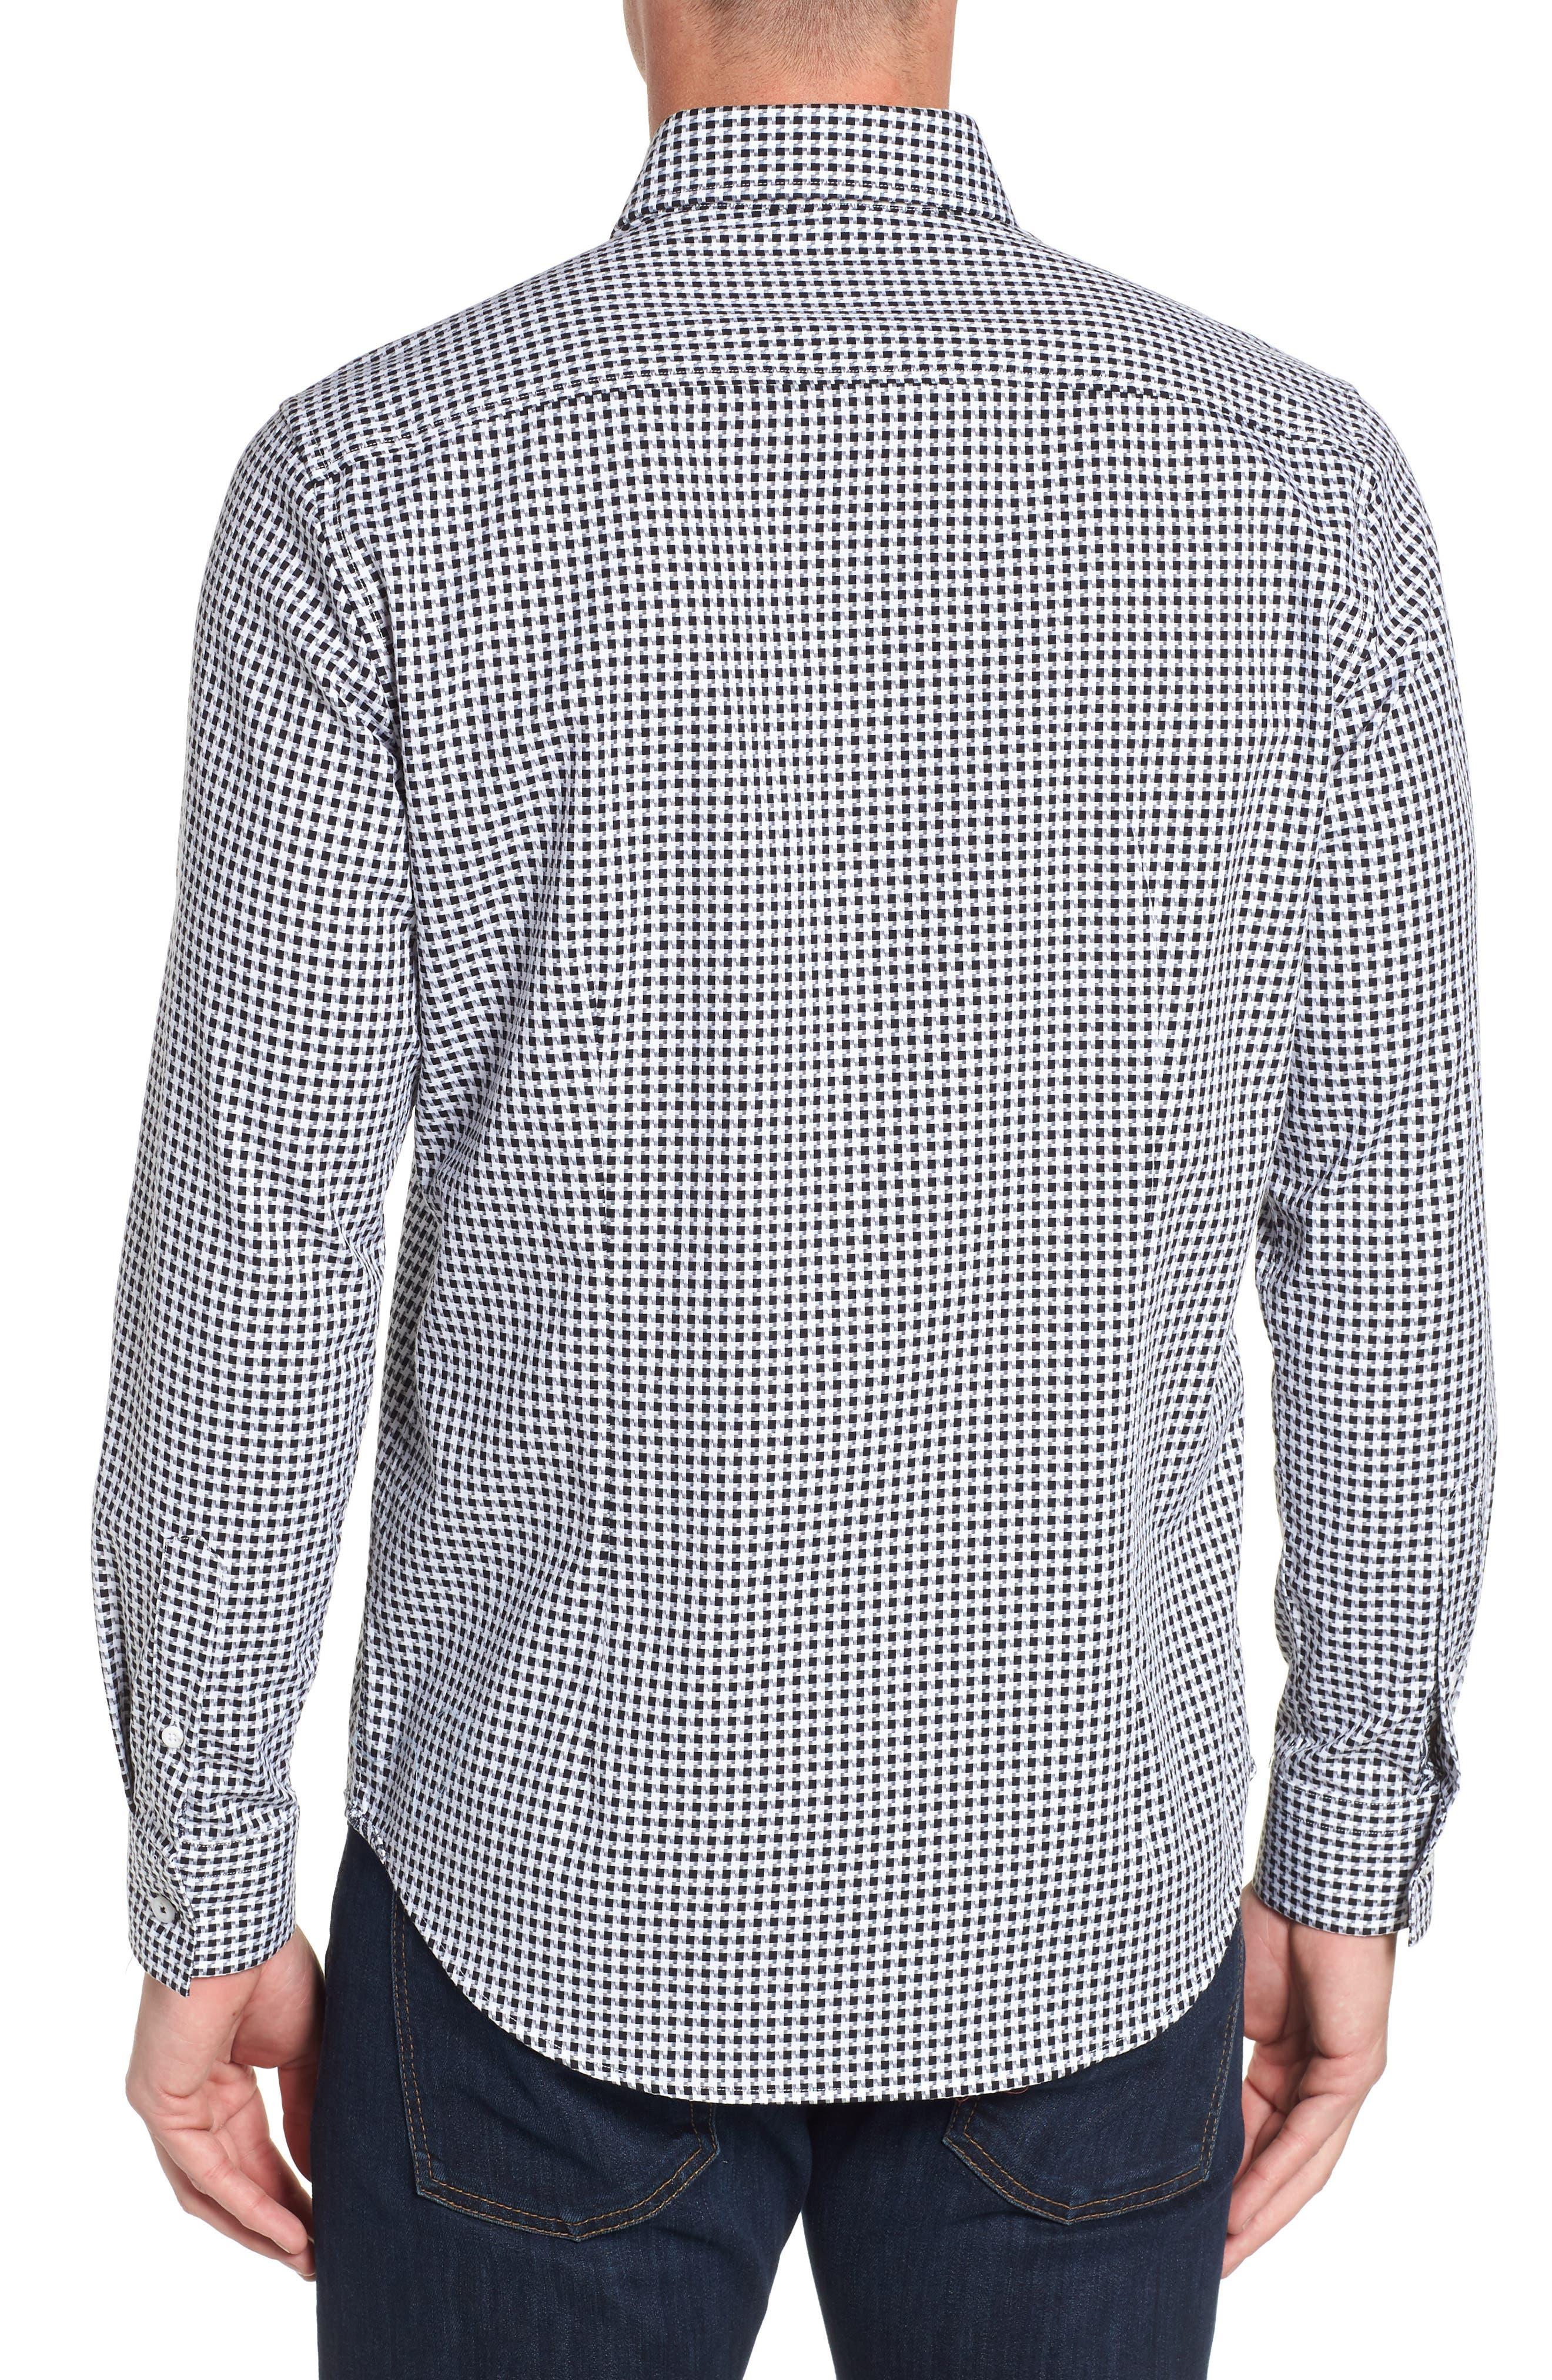 Emmett Tailored Fit Sport Shirt,                             Alternate thumbnail 3, color,                             BLACK